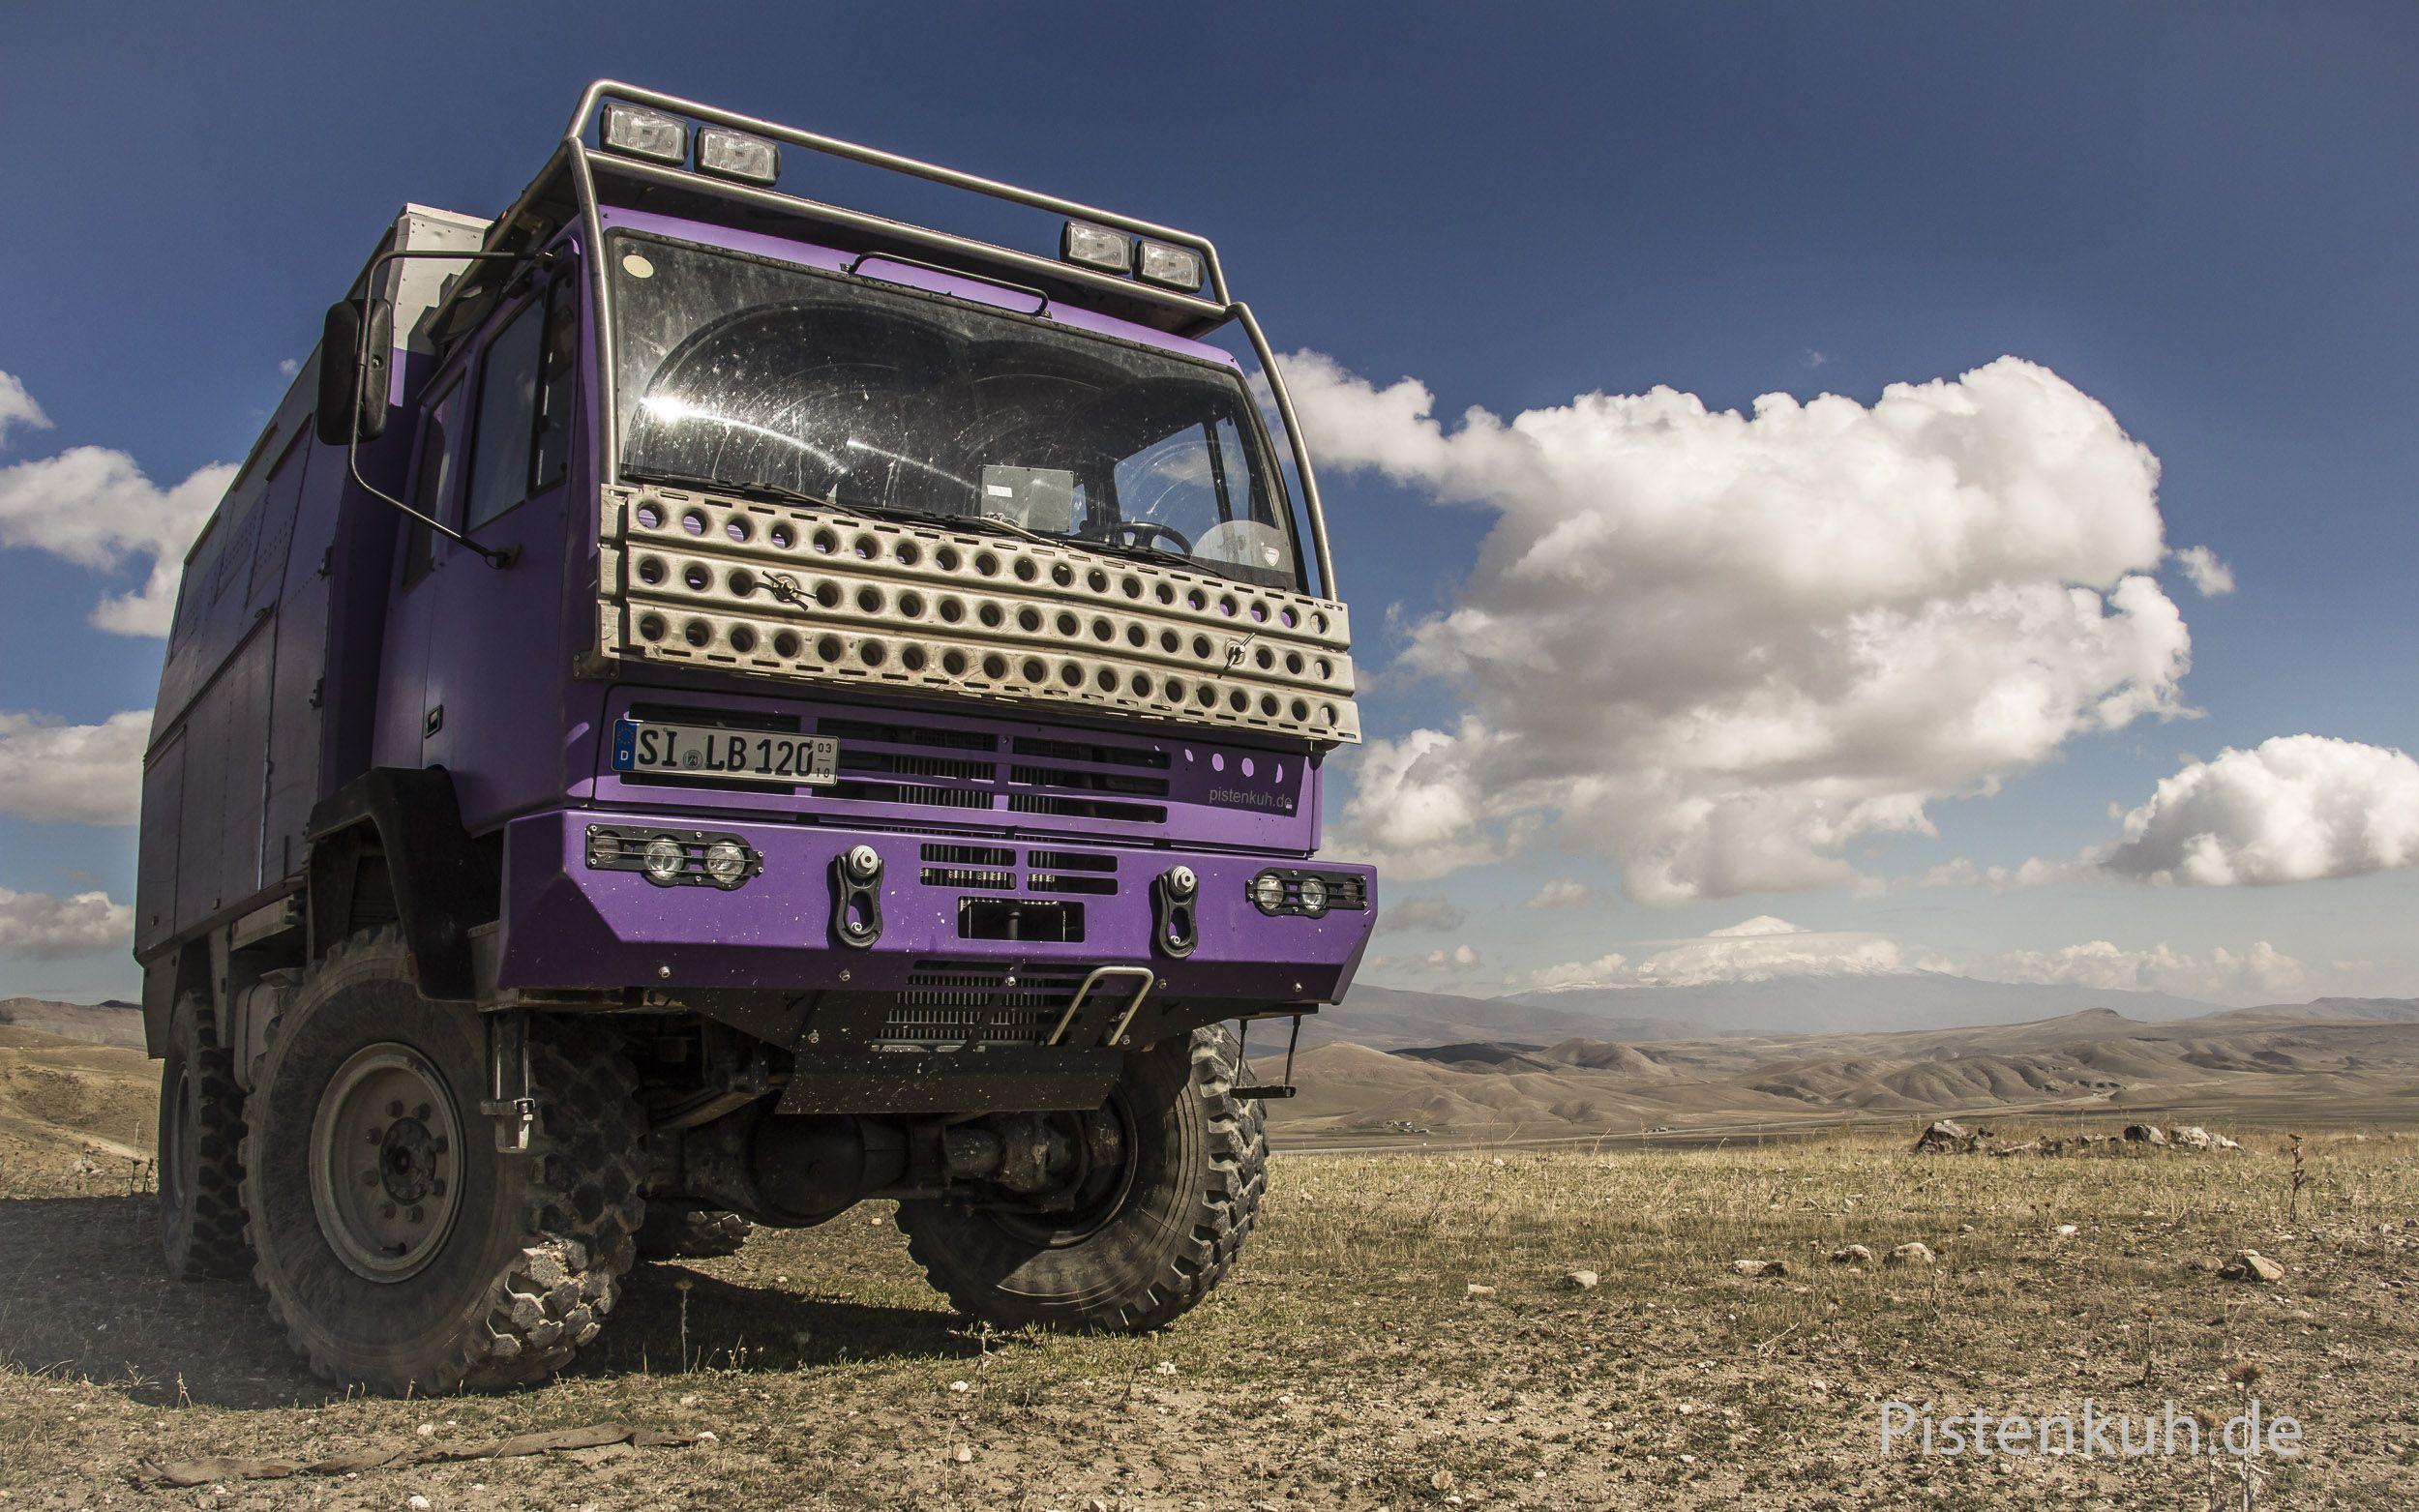 Steyr 12m18 Pistenkuh Expeditionsfahrzeug Expeditionsmobil Reisemobil